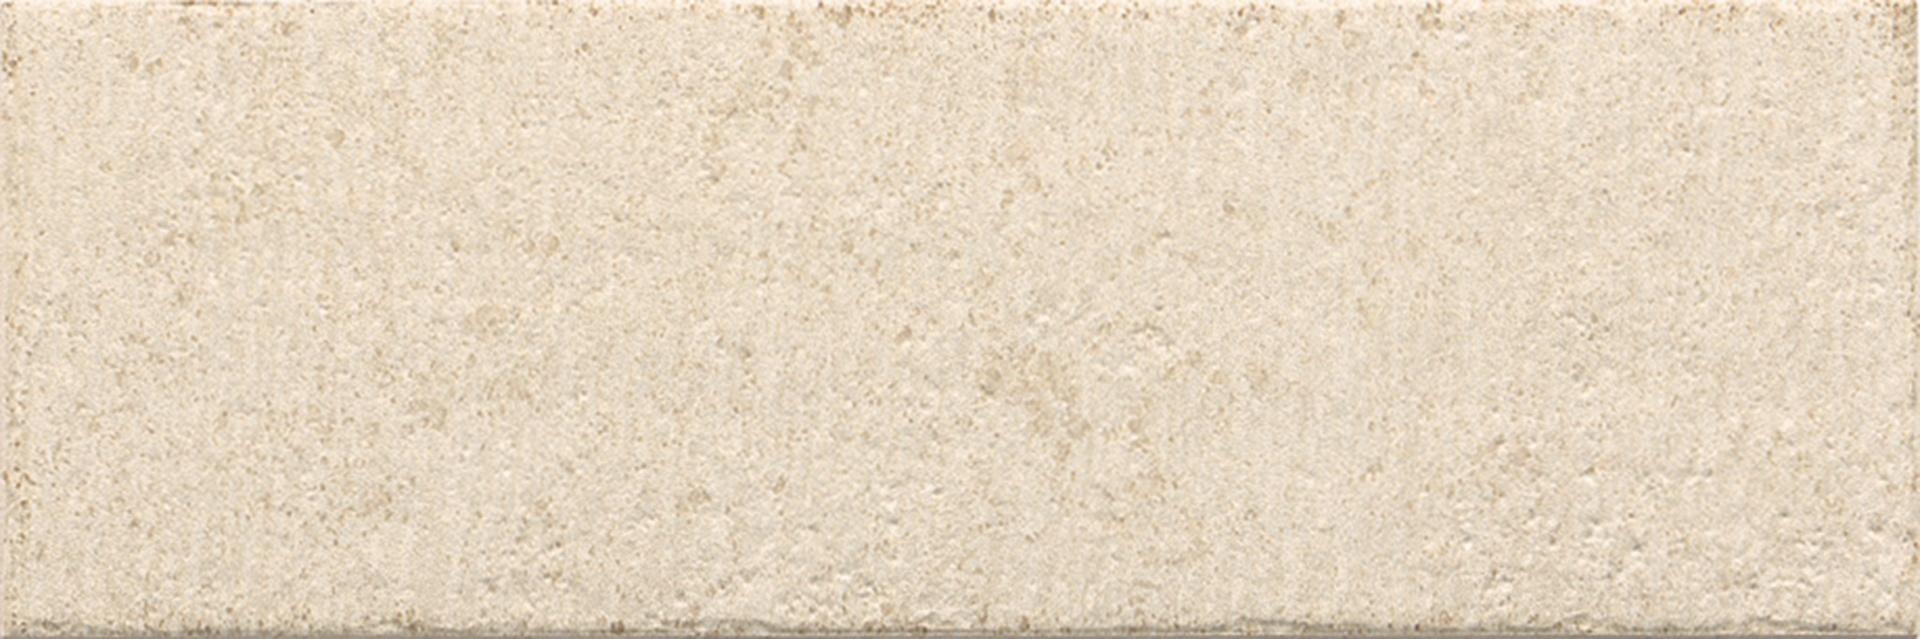 Backsplash Tiles Commodore Of Pennsylvania